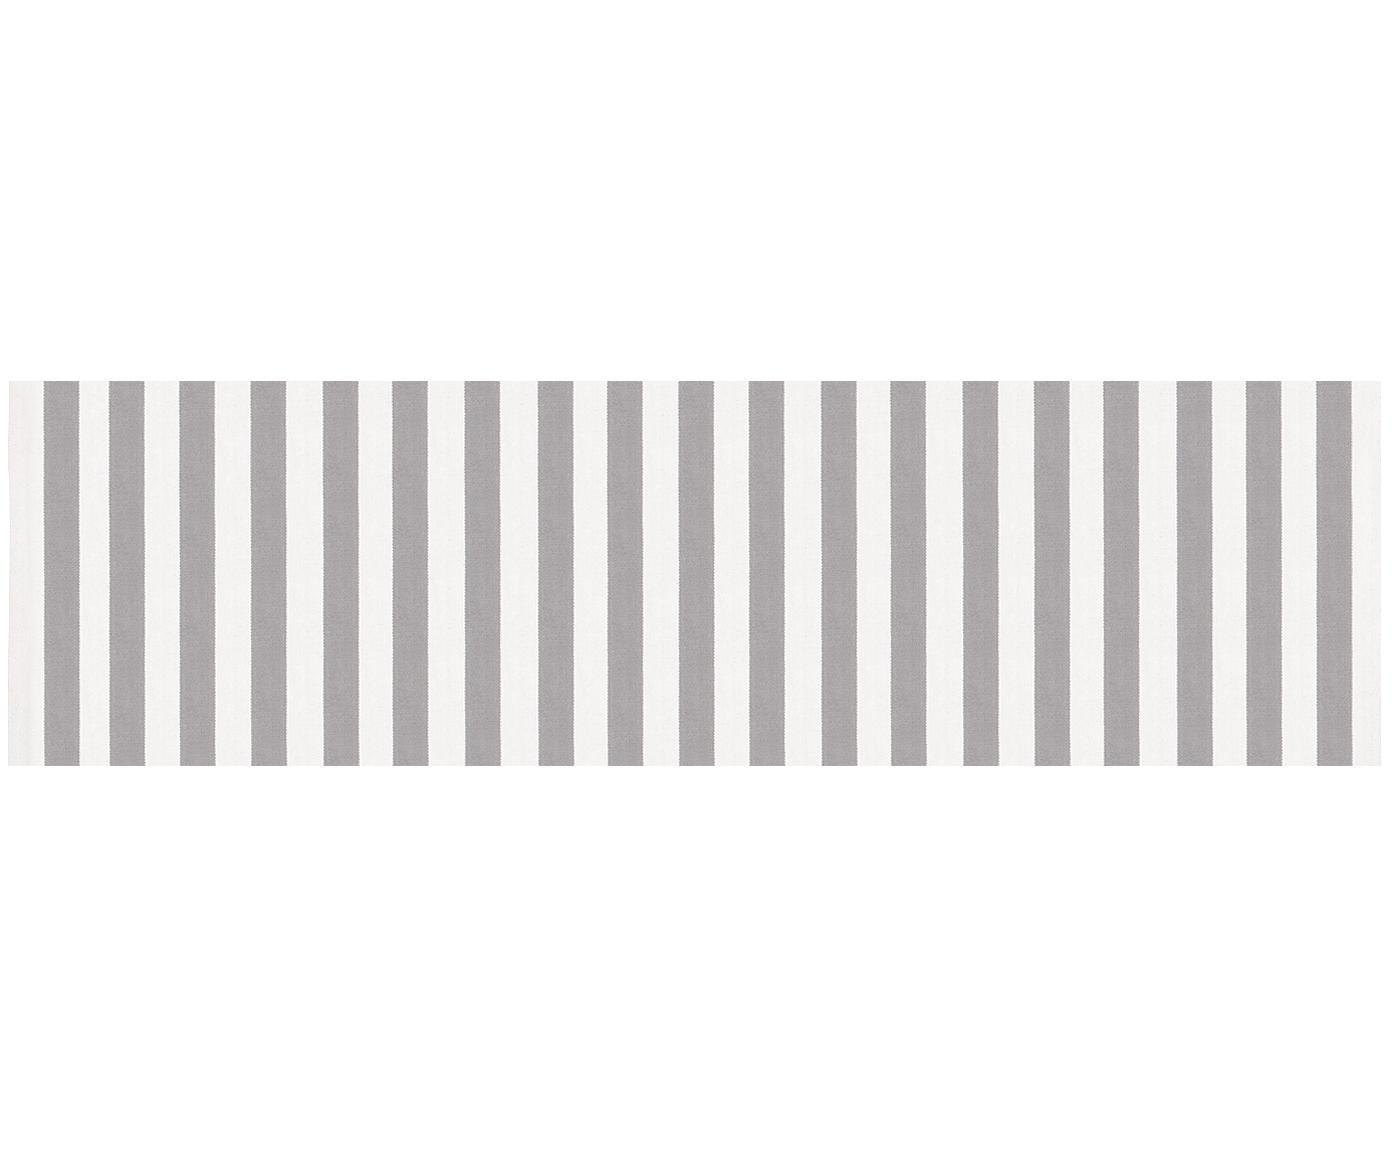 Alfombra artesanal de algodón Blocker, Algodón, Blanco crema, gris claro, An 70 x L 250 cm